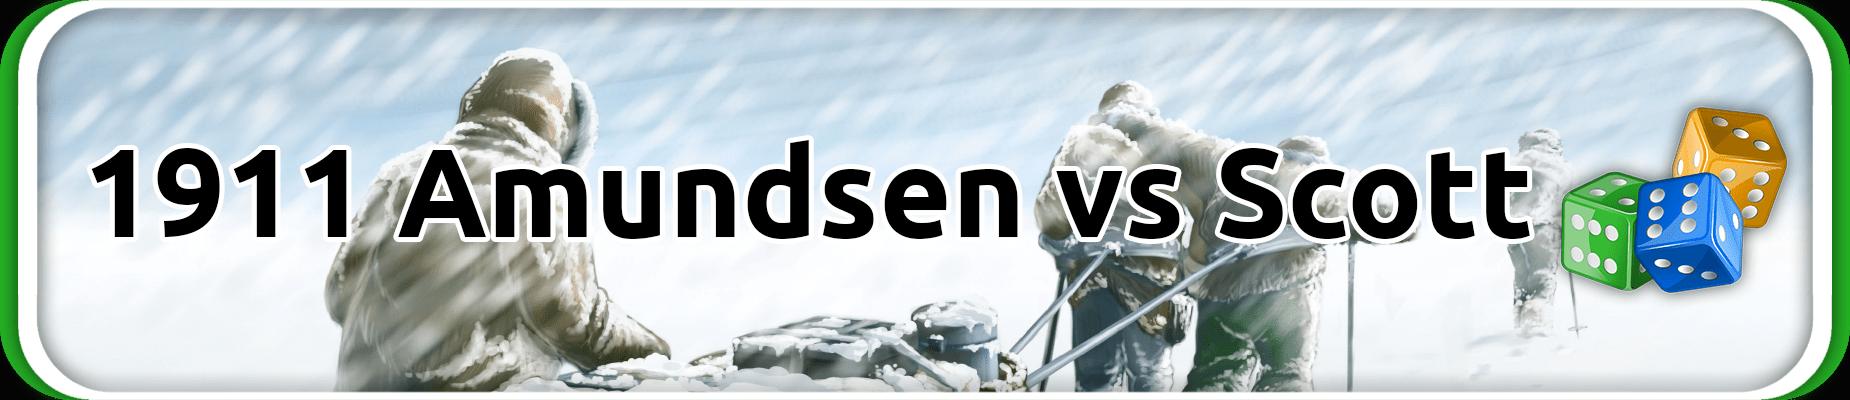 1911AmundsenVsScott